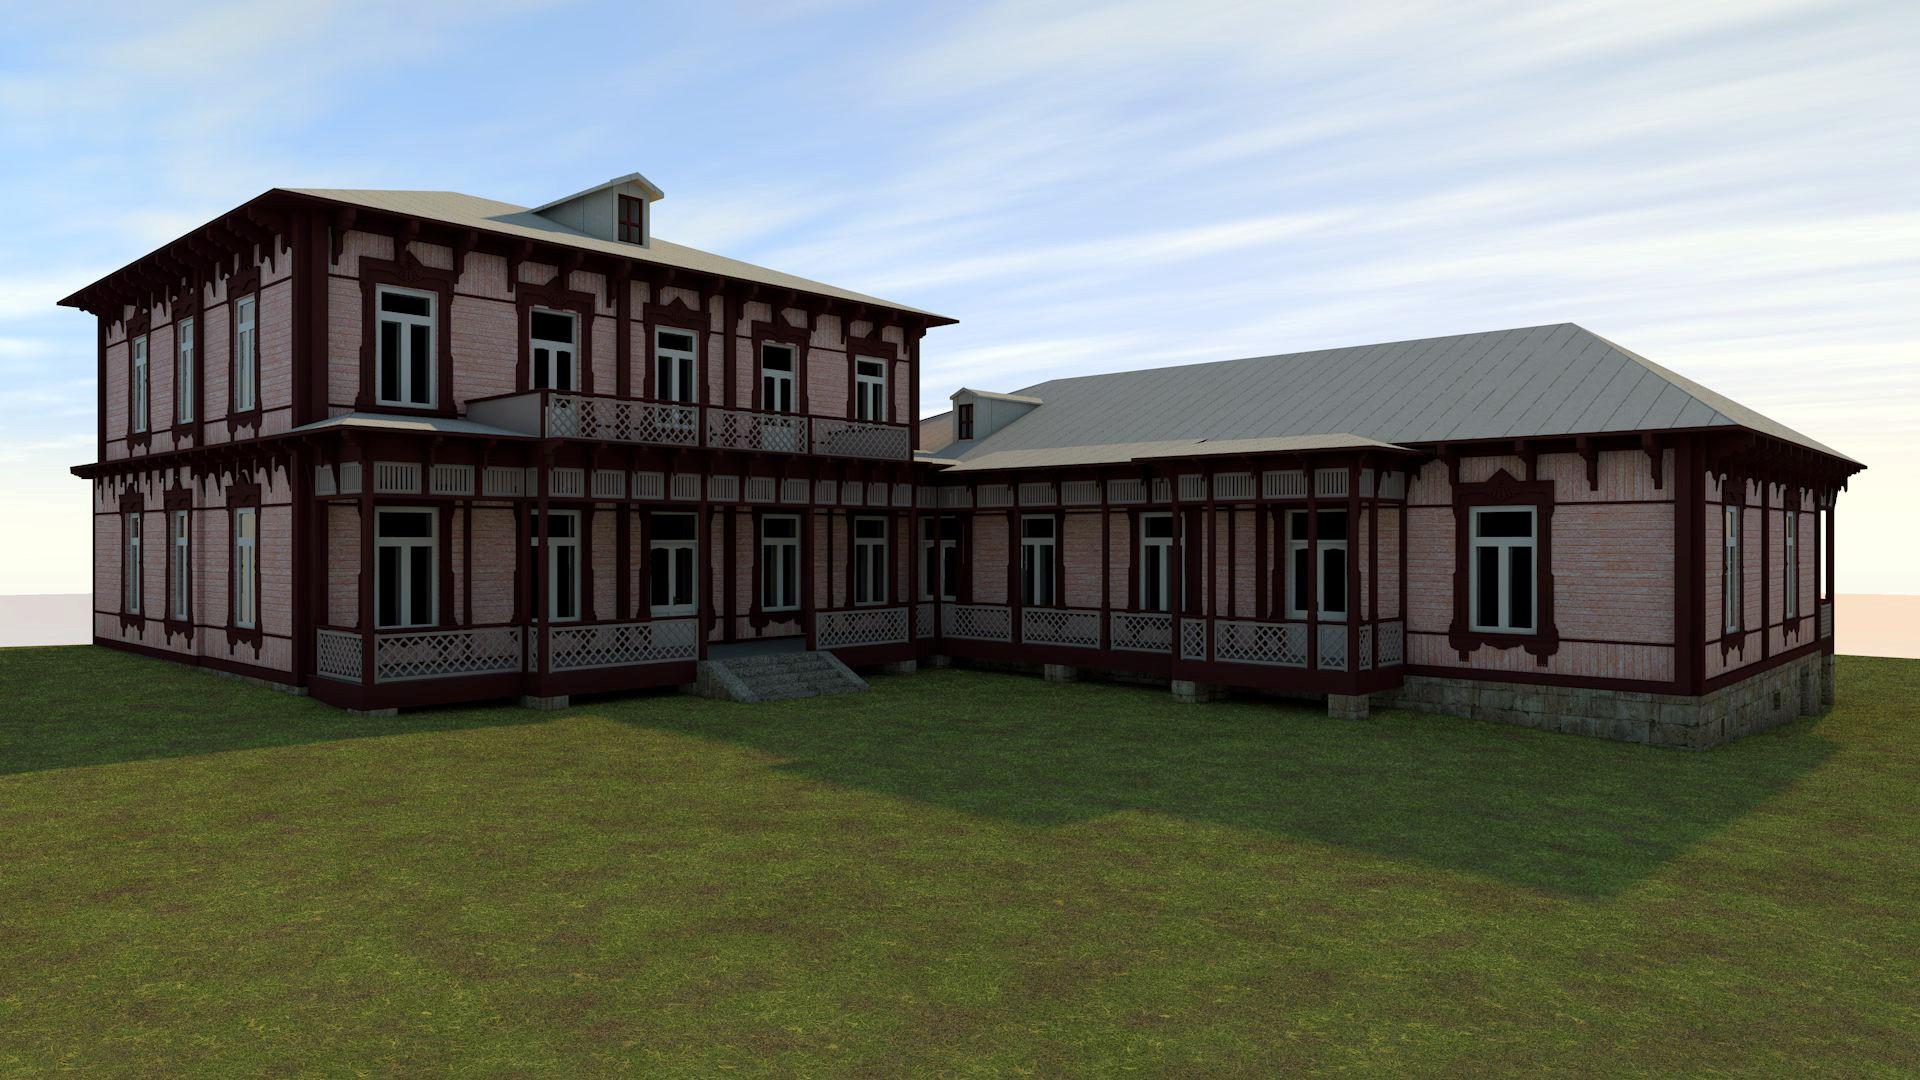 Adigeni Municipality, Abastumani Settlement, Rehabilitation Project of Former Romanov Middle Palace located on Paliashvili Street N24a